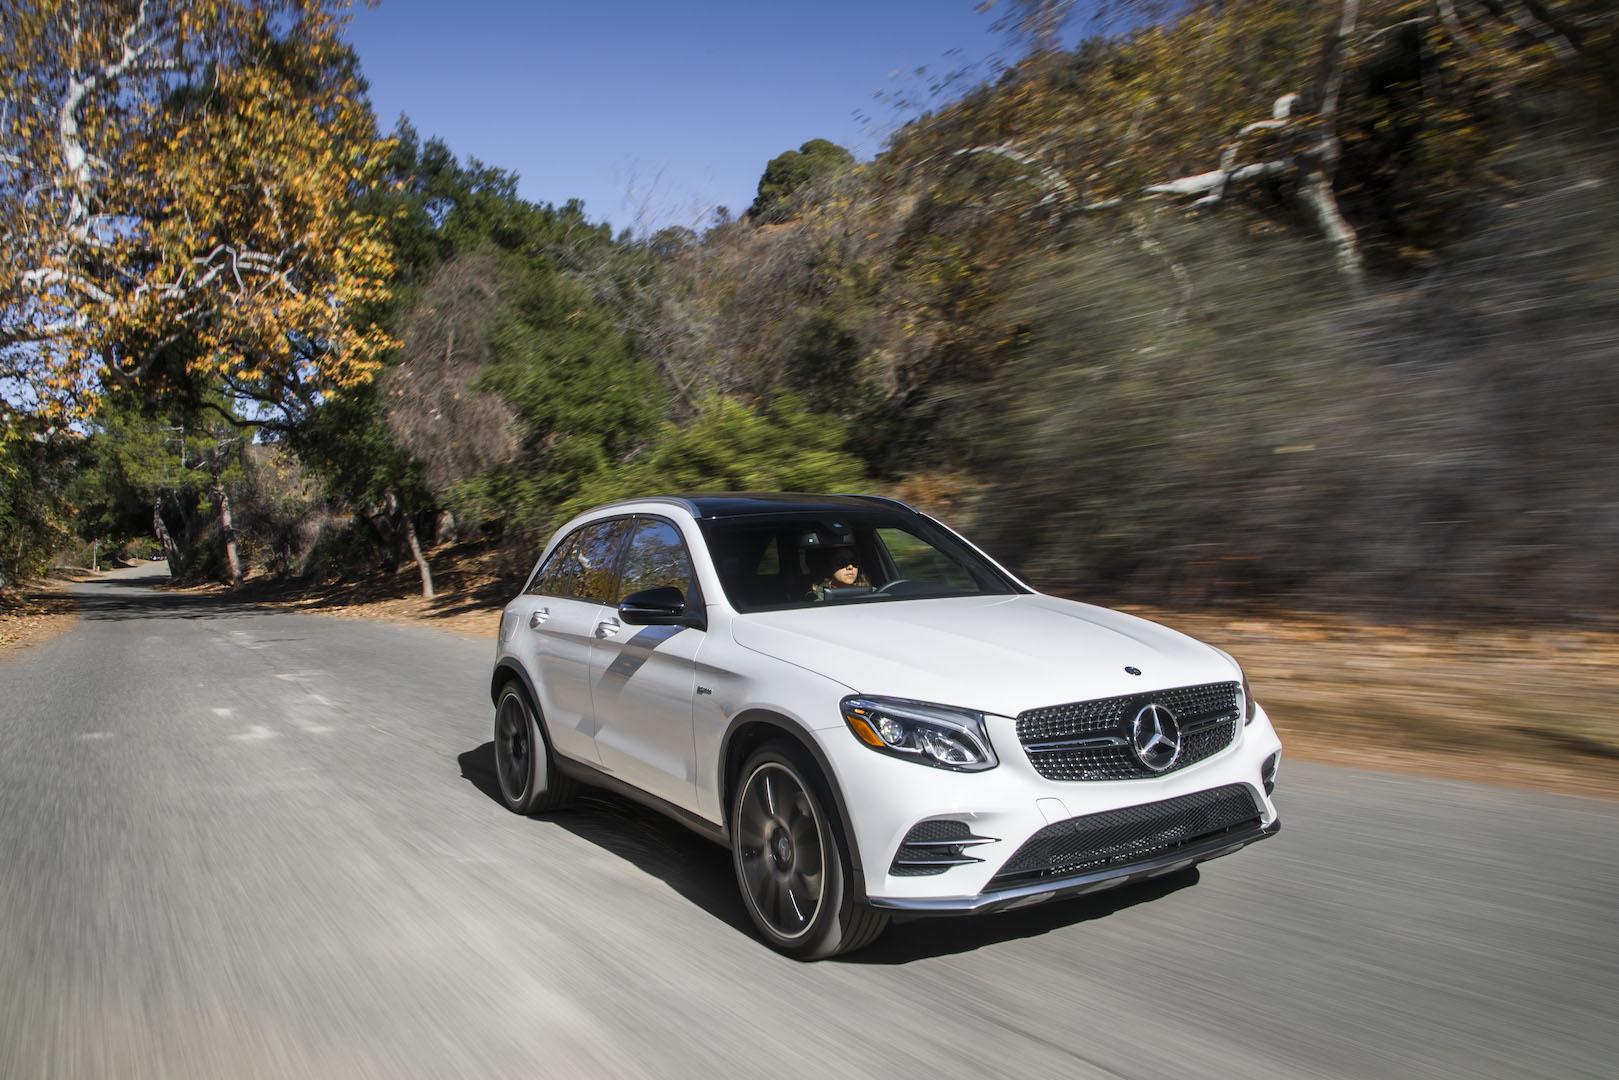 2019 Mercedes-Benz GLC Class Review, Ratings, Specs ...